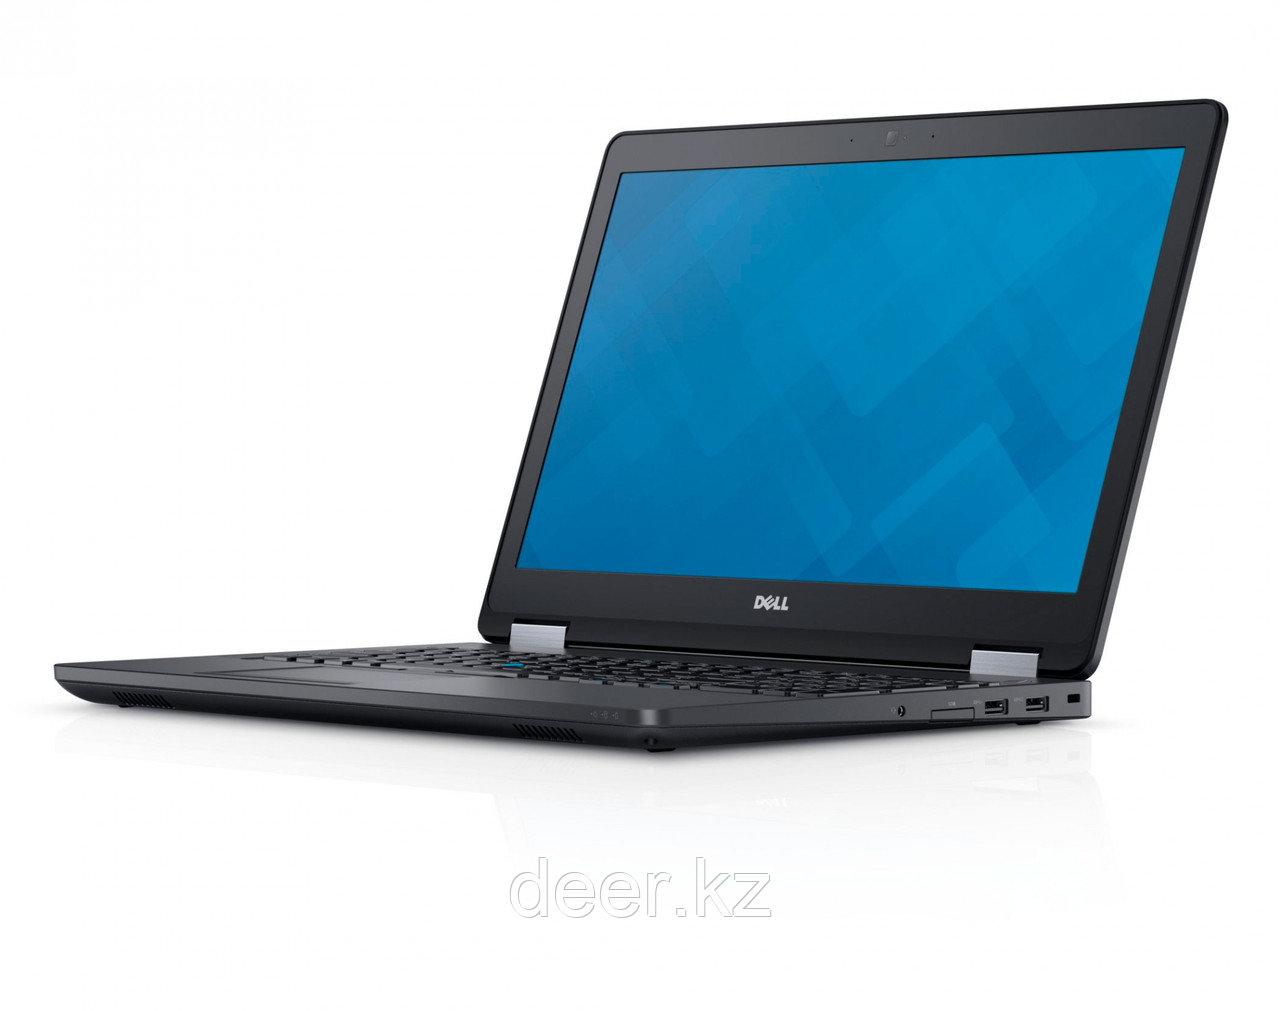 Мобильная рабочая станция Dell 15,6 ''/Precision 3510 /Intel Core i5 6440HQ 210-AFLF